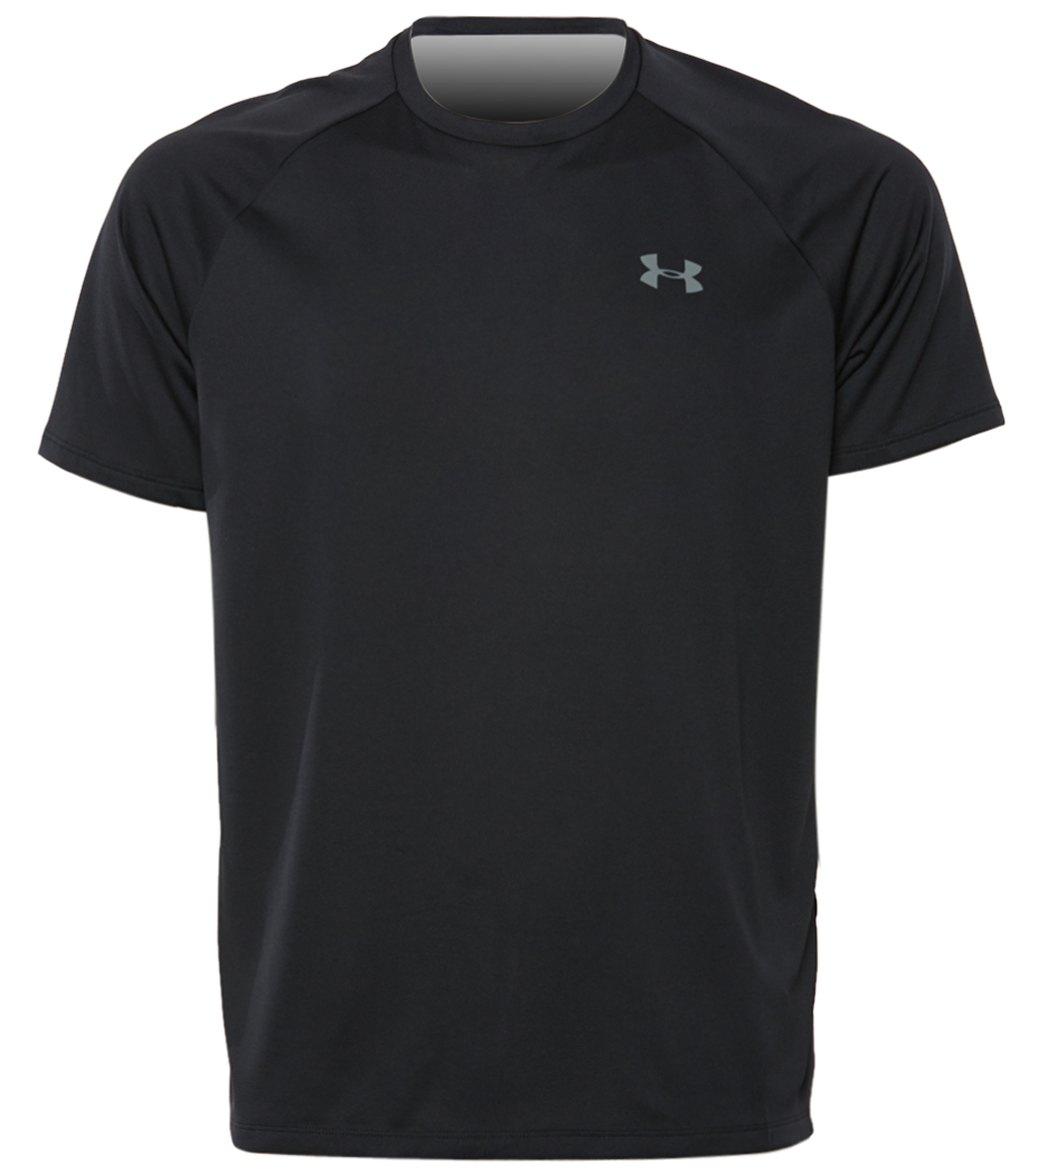 a500157c Under Armour Men's UA Tech 2.0 Short Sleeve Tee at SwimOutlet.com